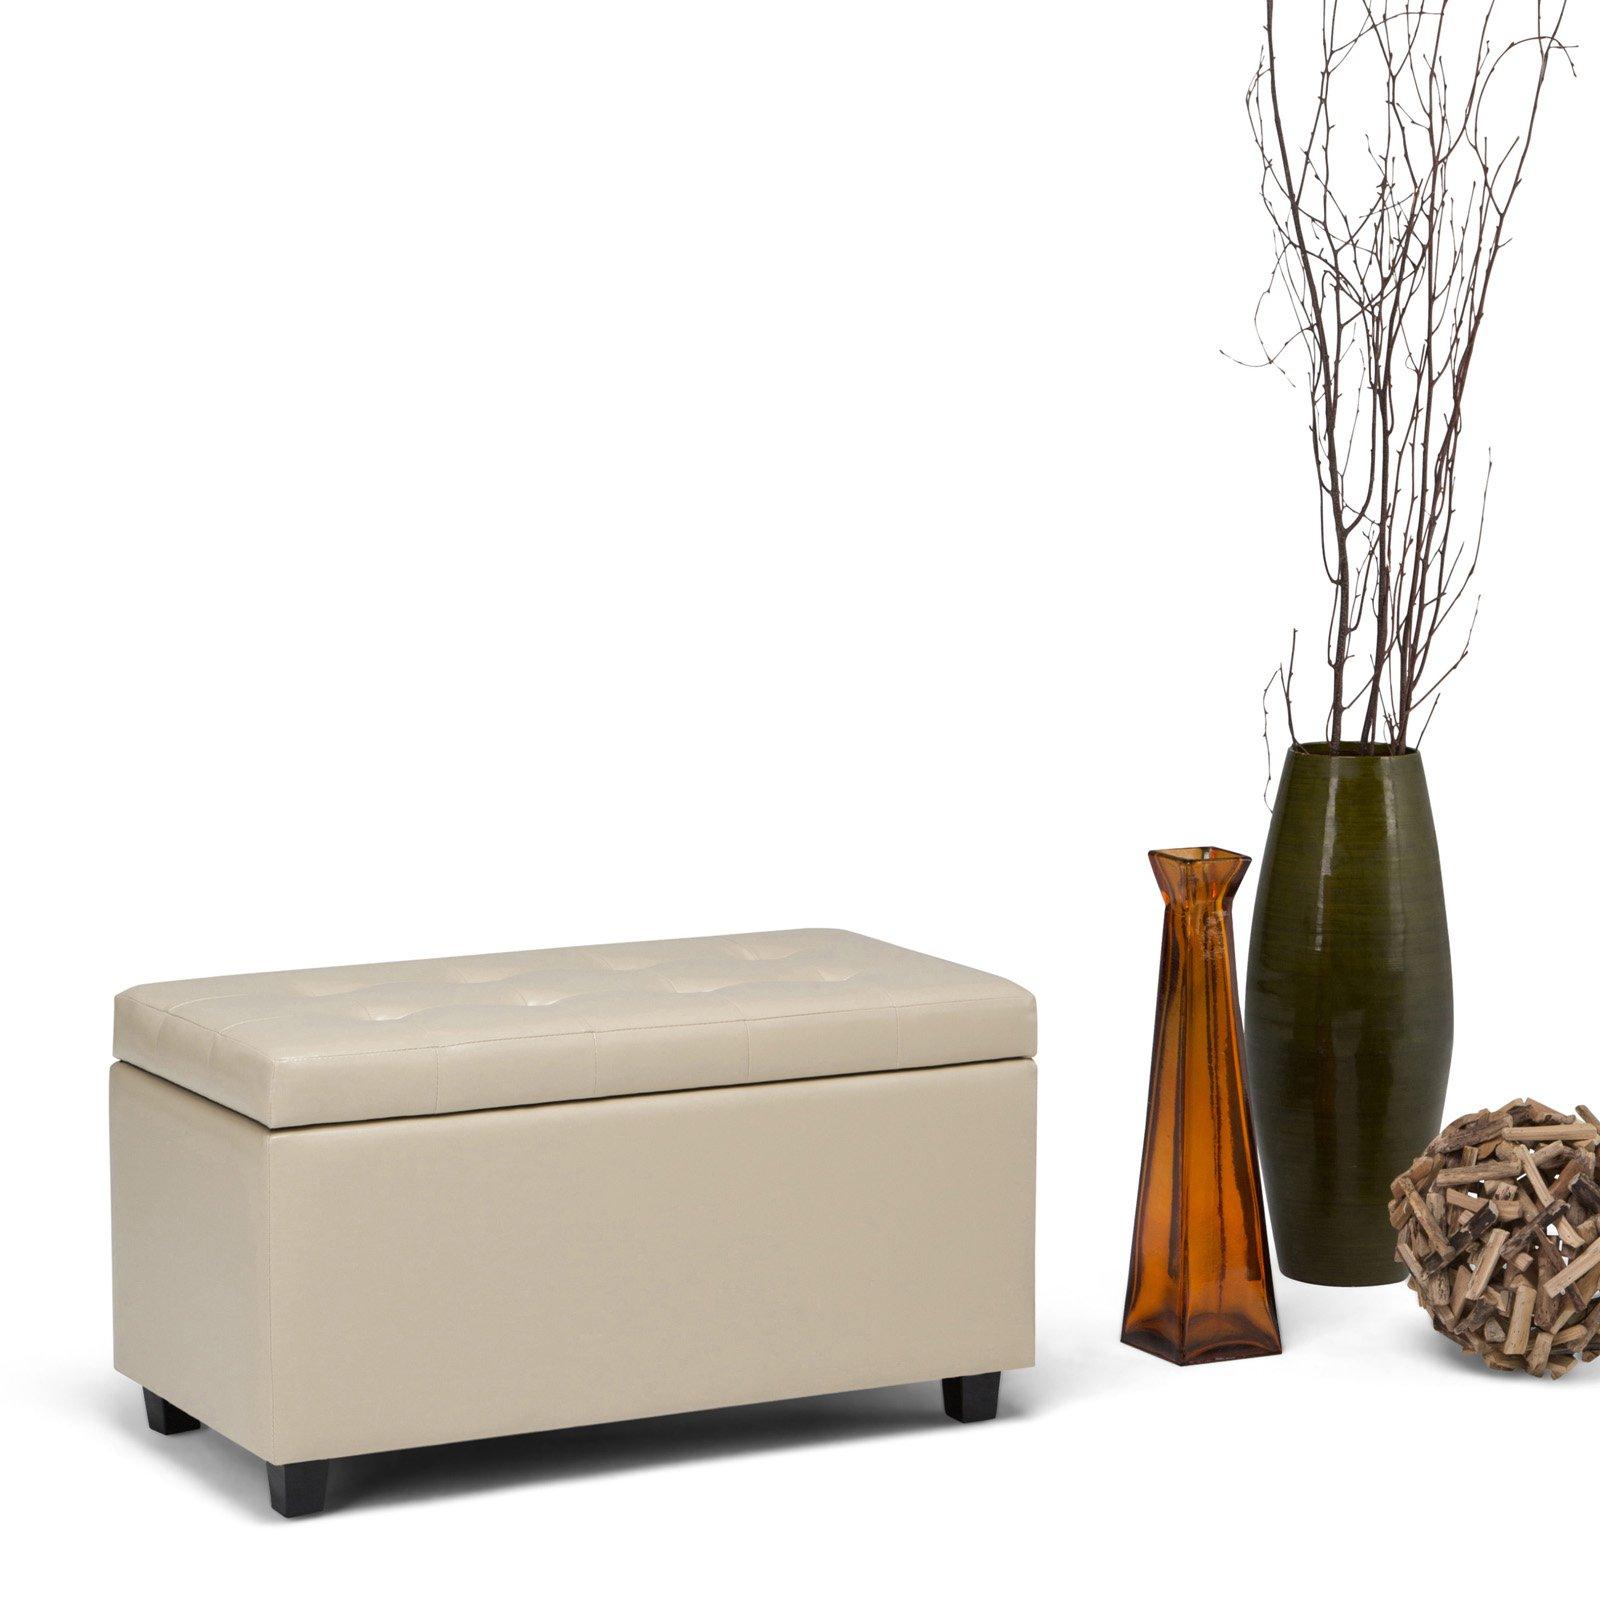 Simpli Home Cosmopolitan Medium Storage Ottoman Bench